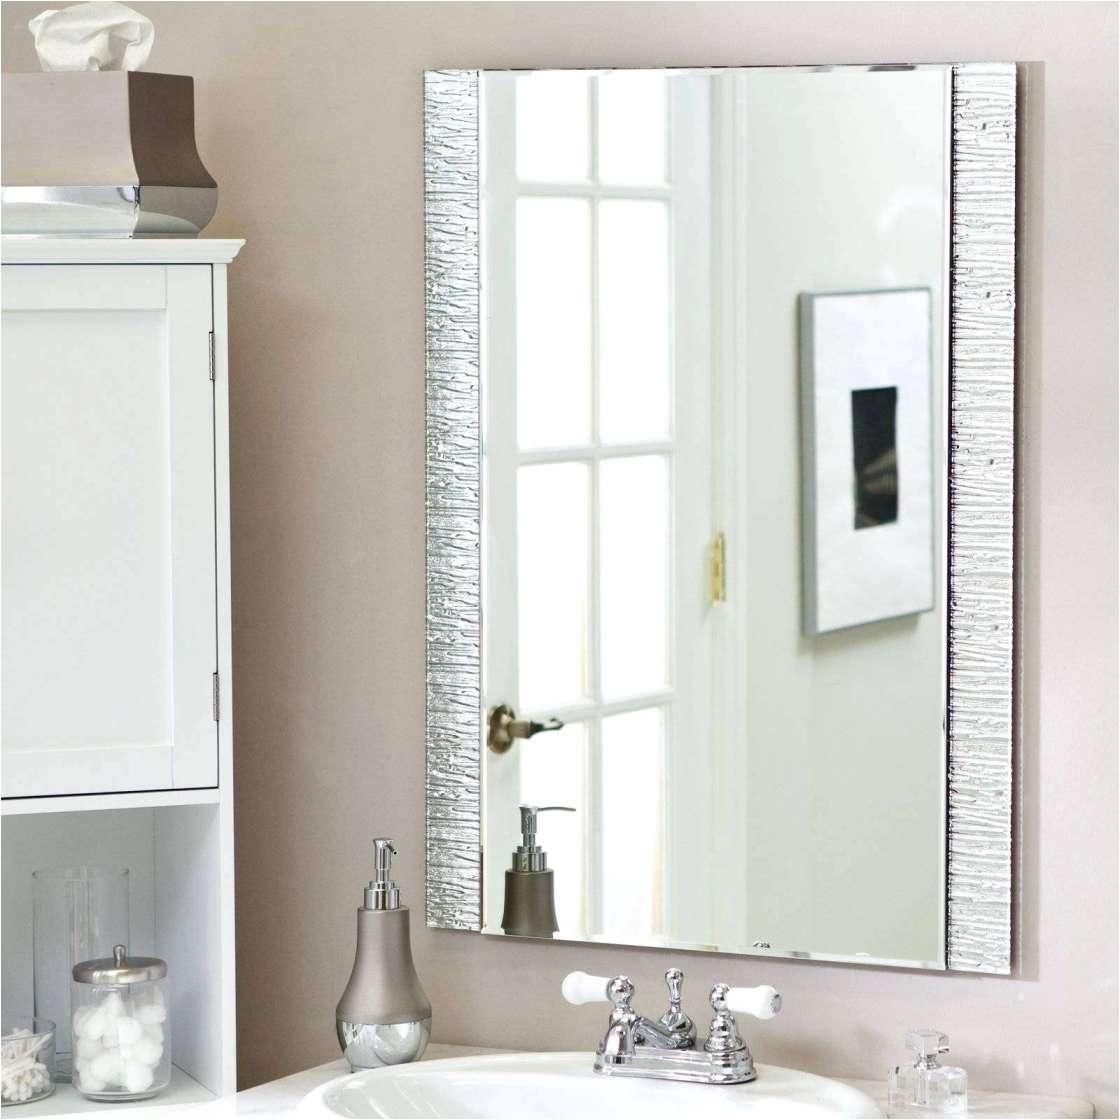 Small Bathroom Design s Elegant Elegant Small Bathroom Lighting Fresh Tag toilet Ideas 0d Best M7g